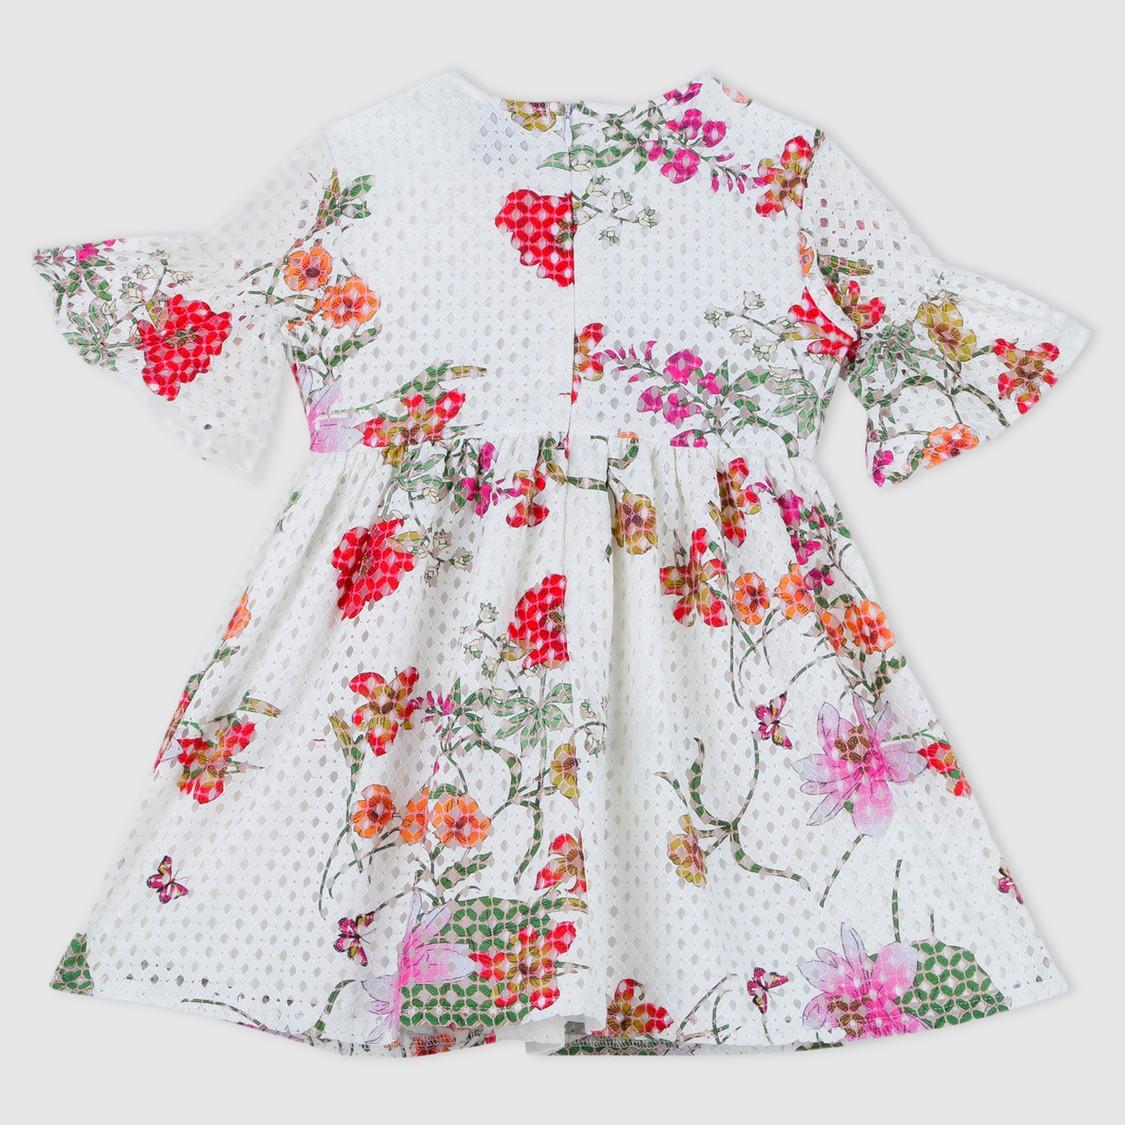 Floral Print Short Bell Sleeves Woven Dress